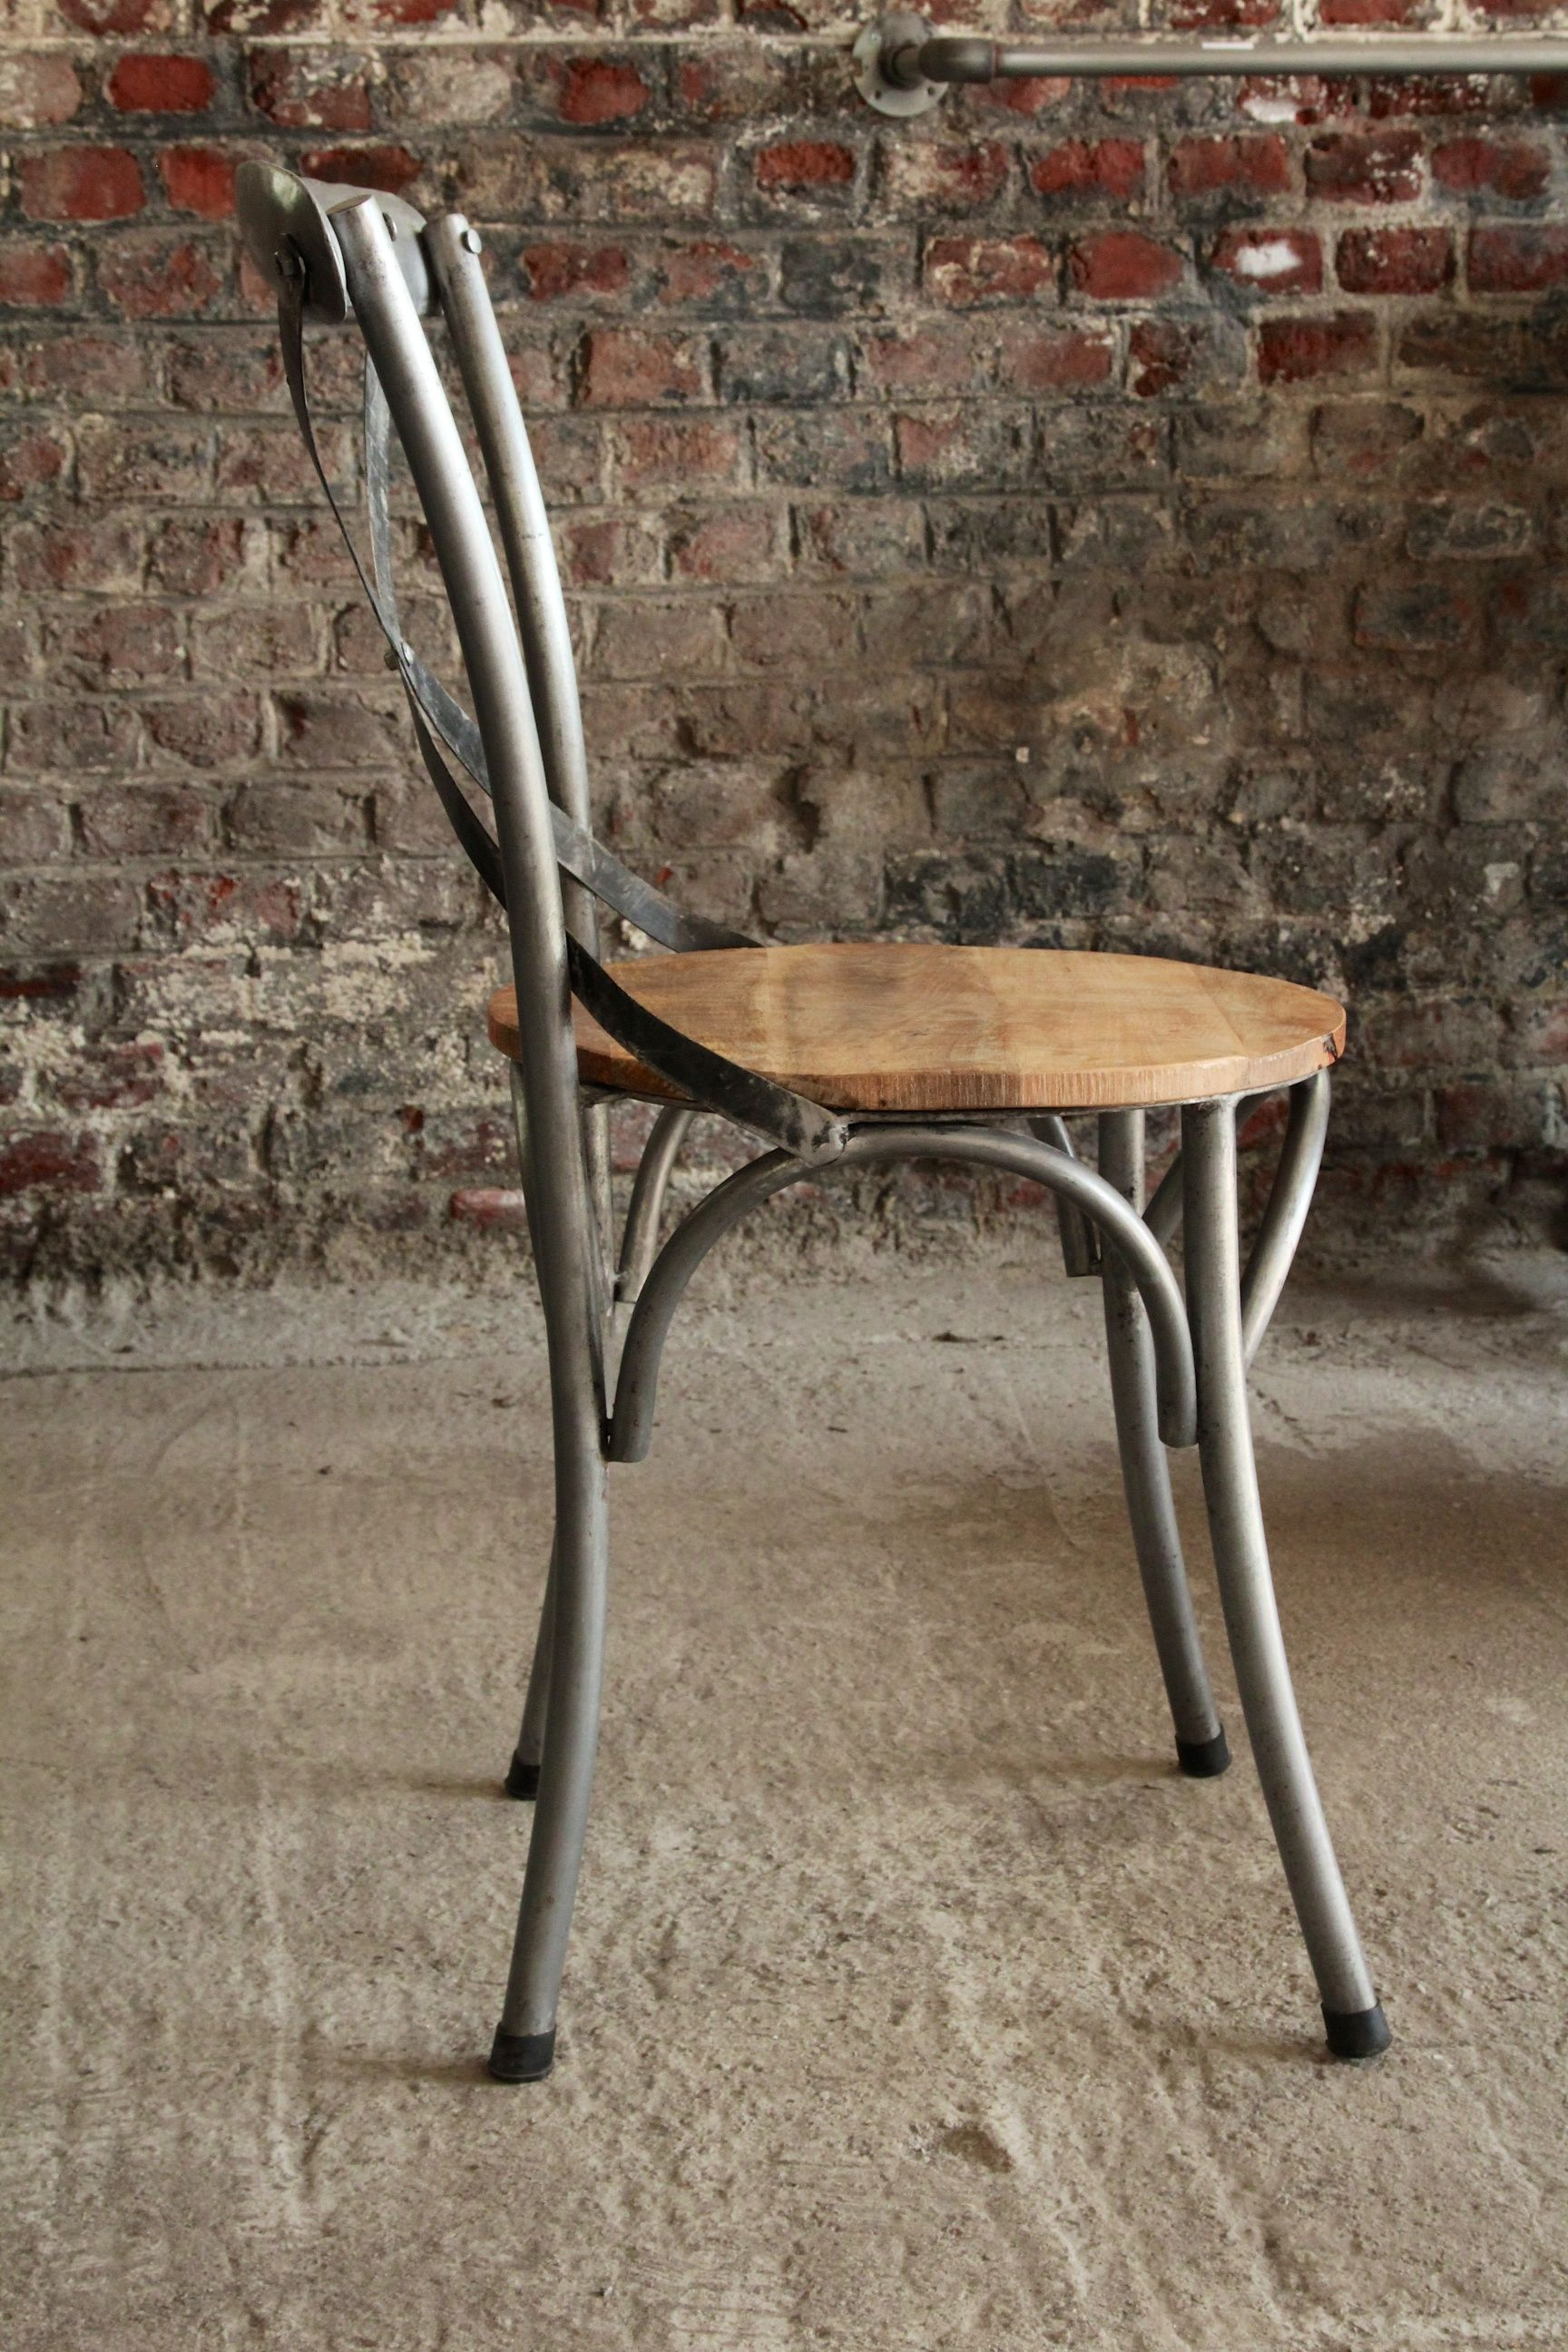 2ab60d9d034c199f90e369e0702a3316 Incroyable De Table Et Chaise De Cuisine Schème